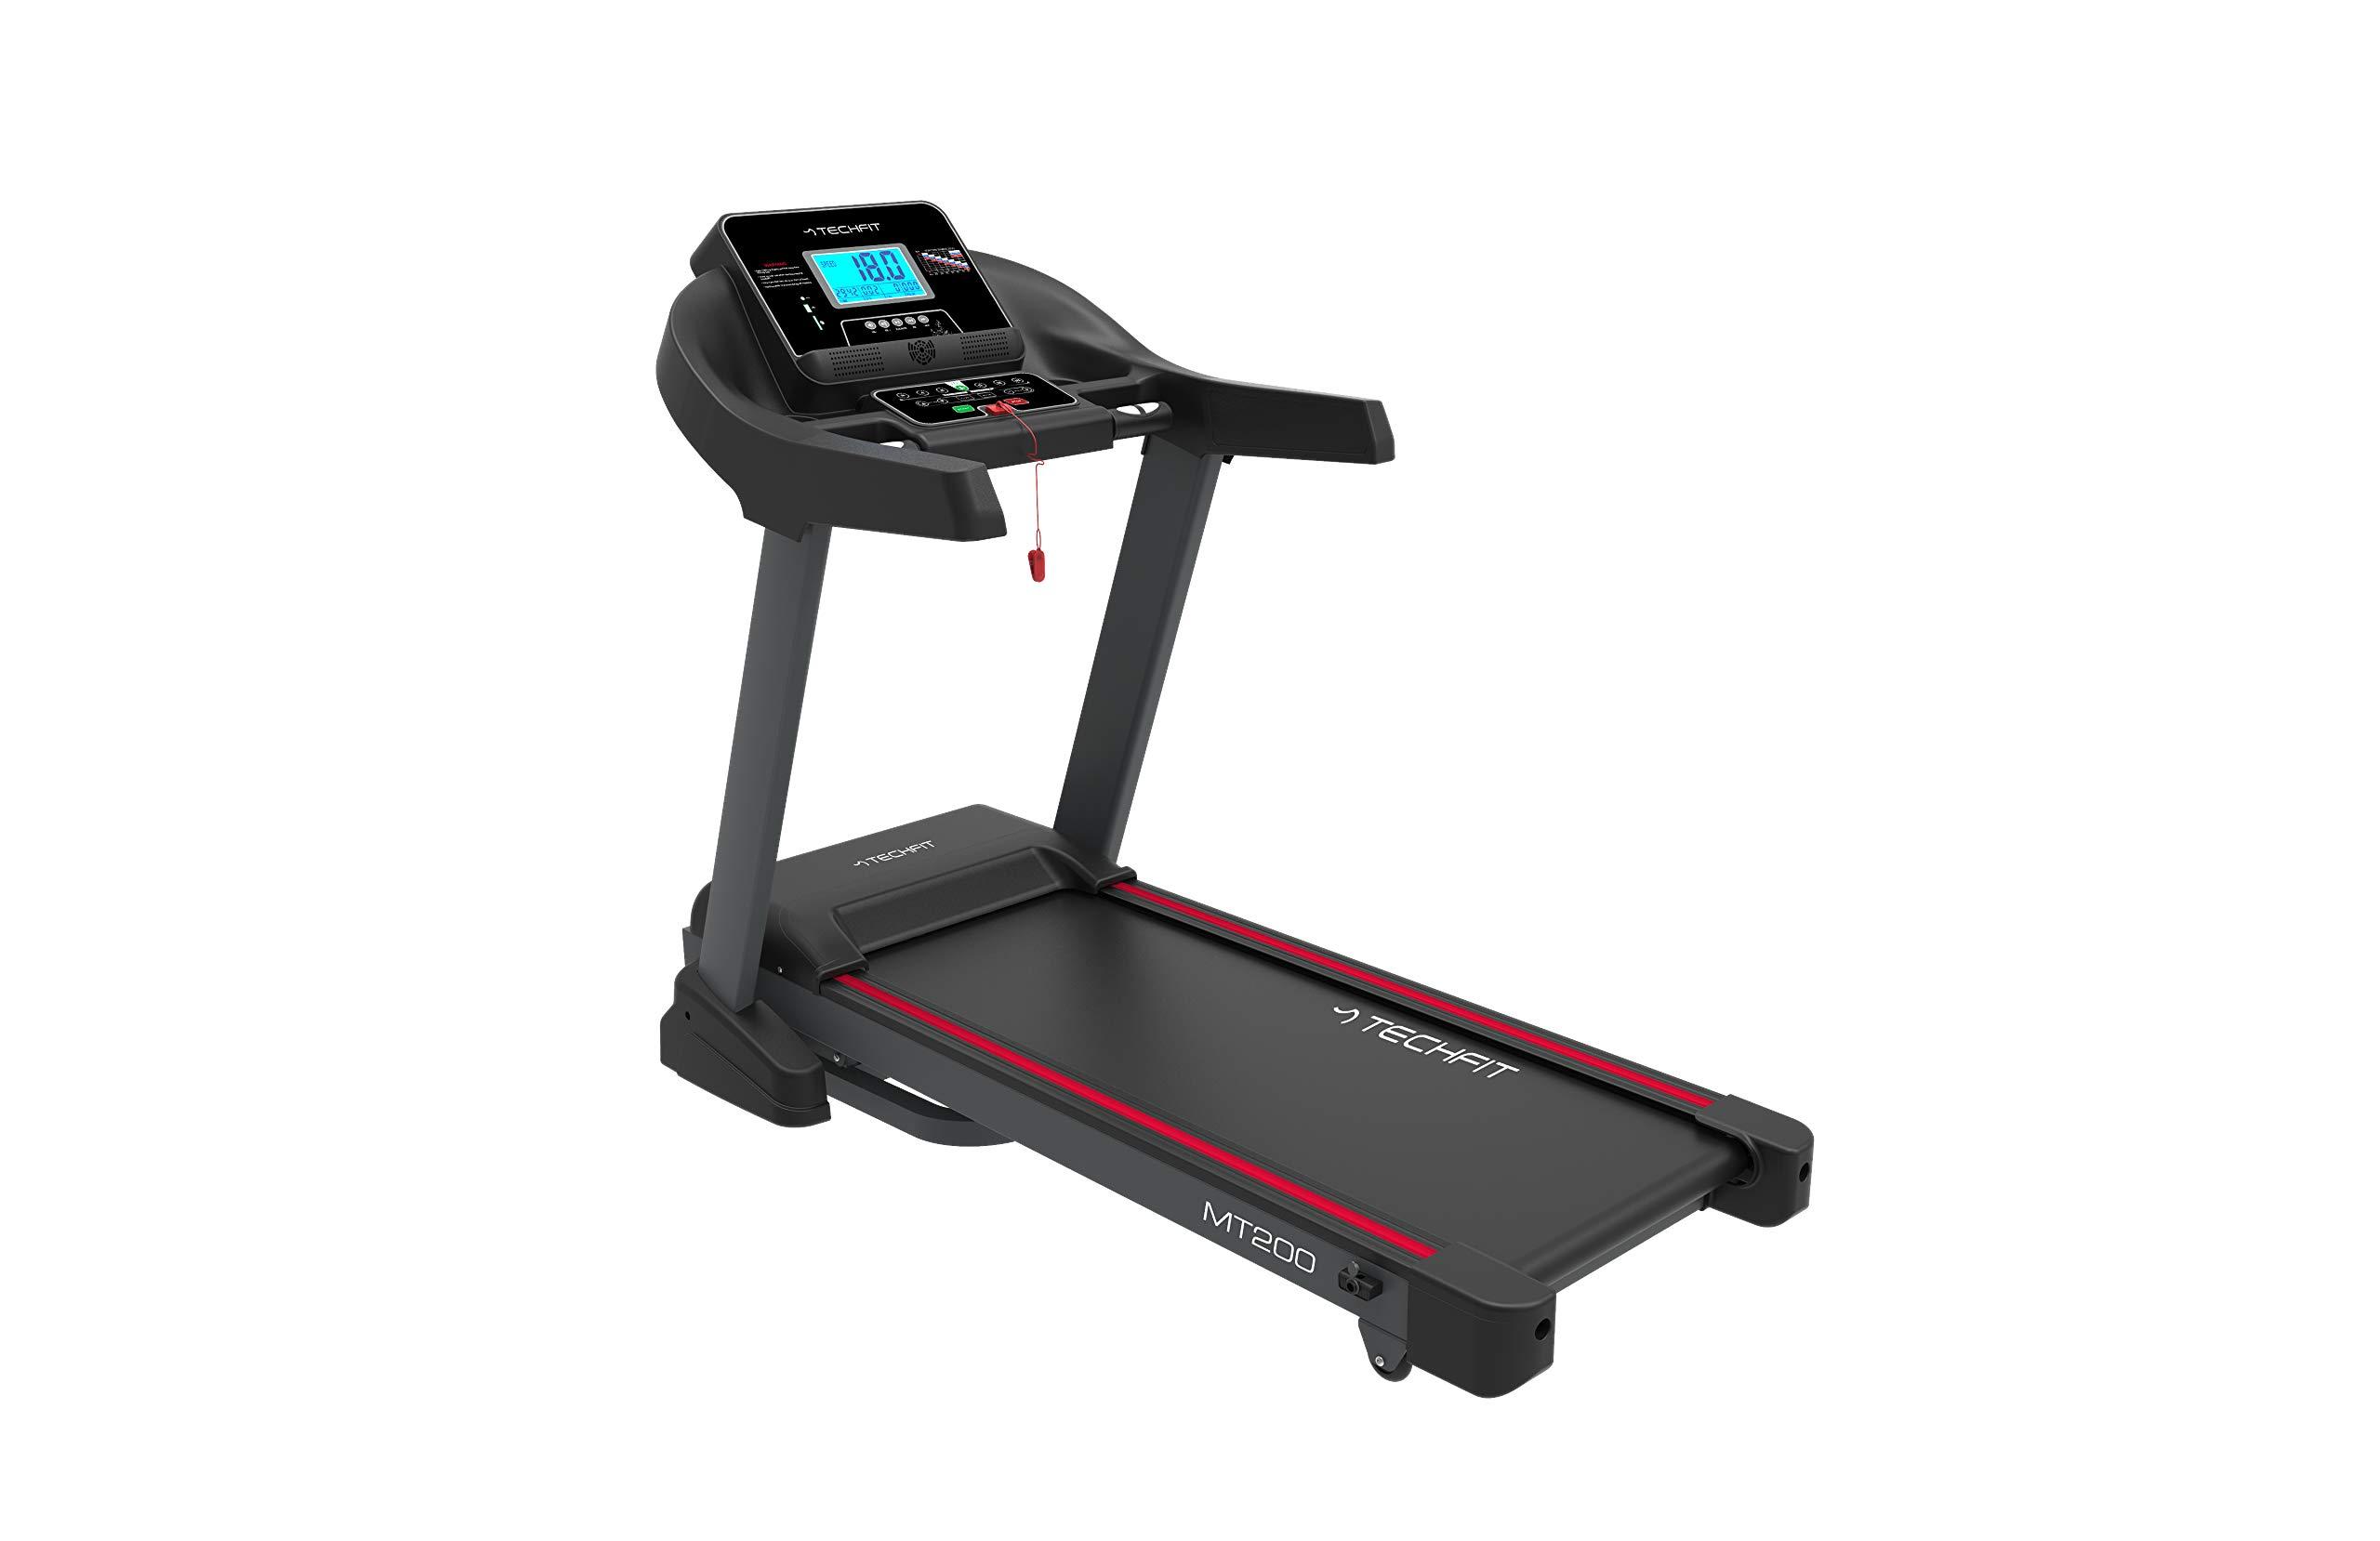 TechFit MT200 Tapis Roulant Professionale, Autolubrificazione, 5.0 HP, Fitness App, Bluetooth, Sistema di Piegatura… 1 spesavip